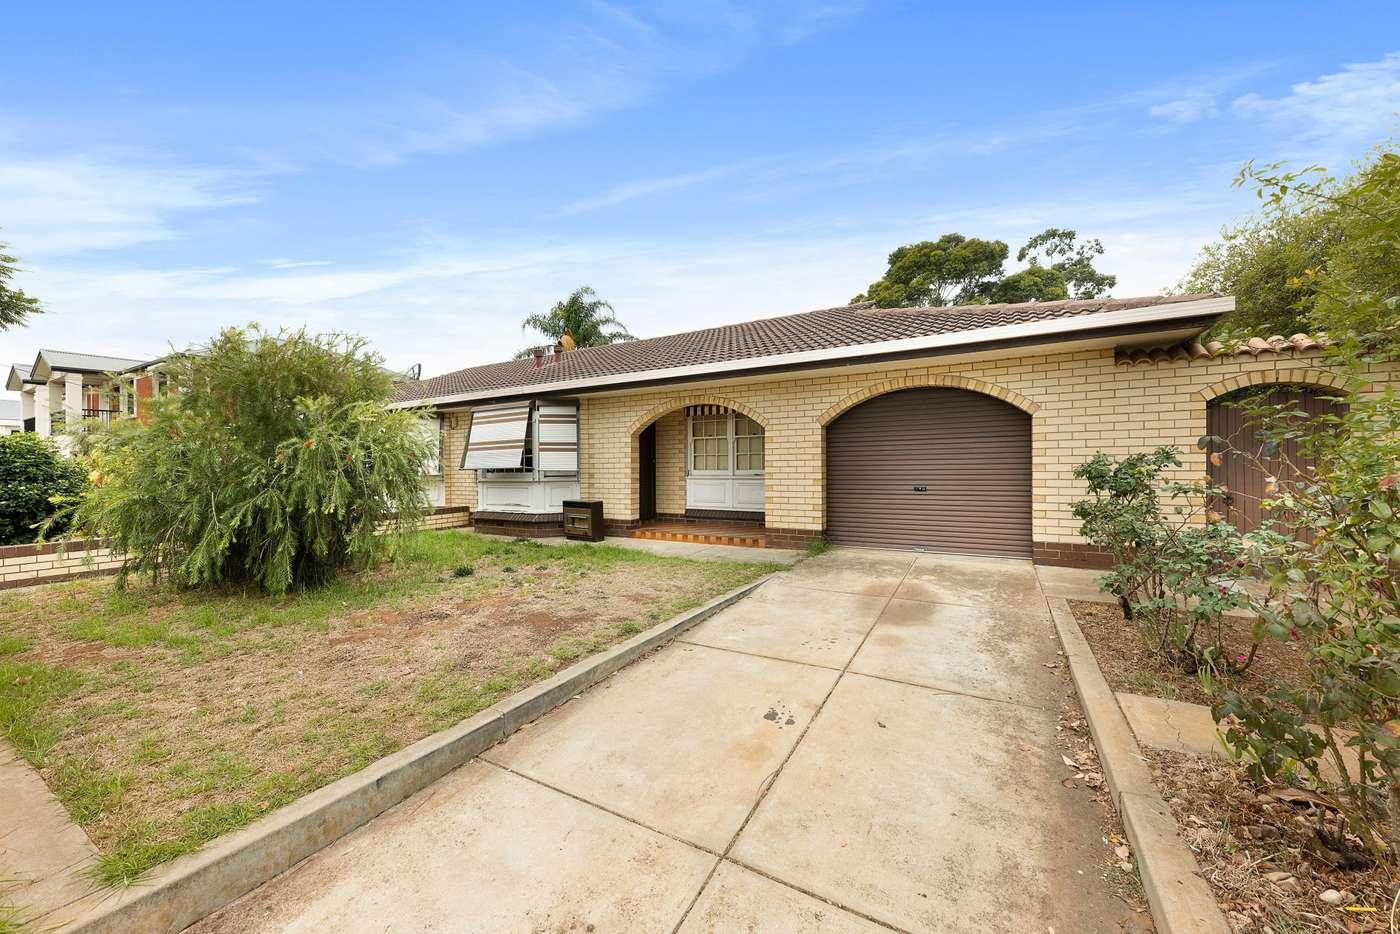 Main view of Homely house listing, 2/92 Ashbrook Avenue, Payneham South SA 5070